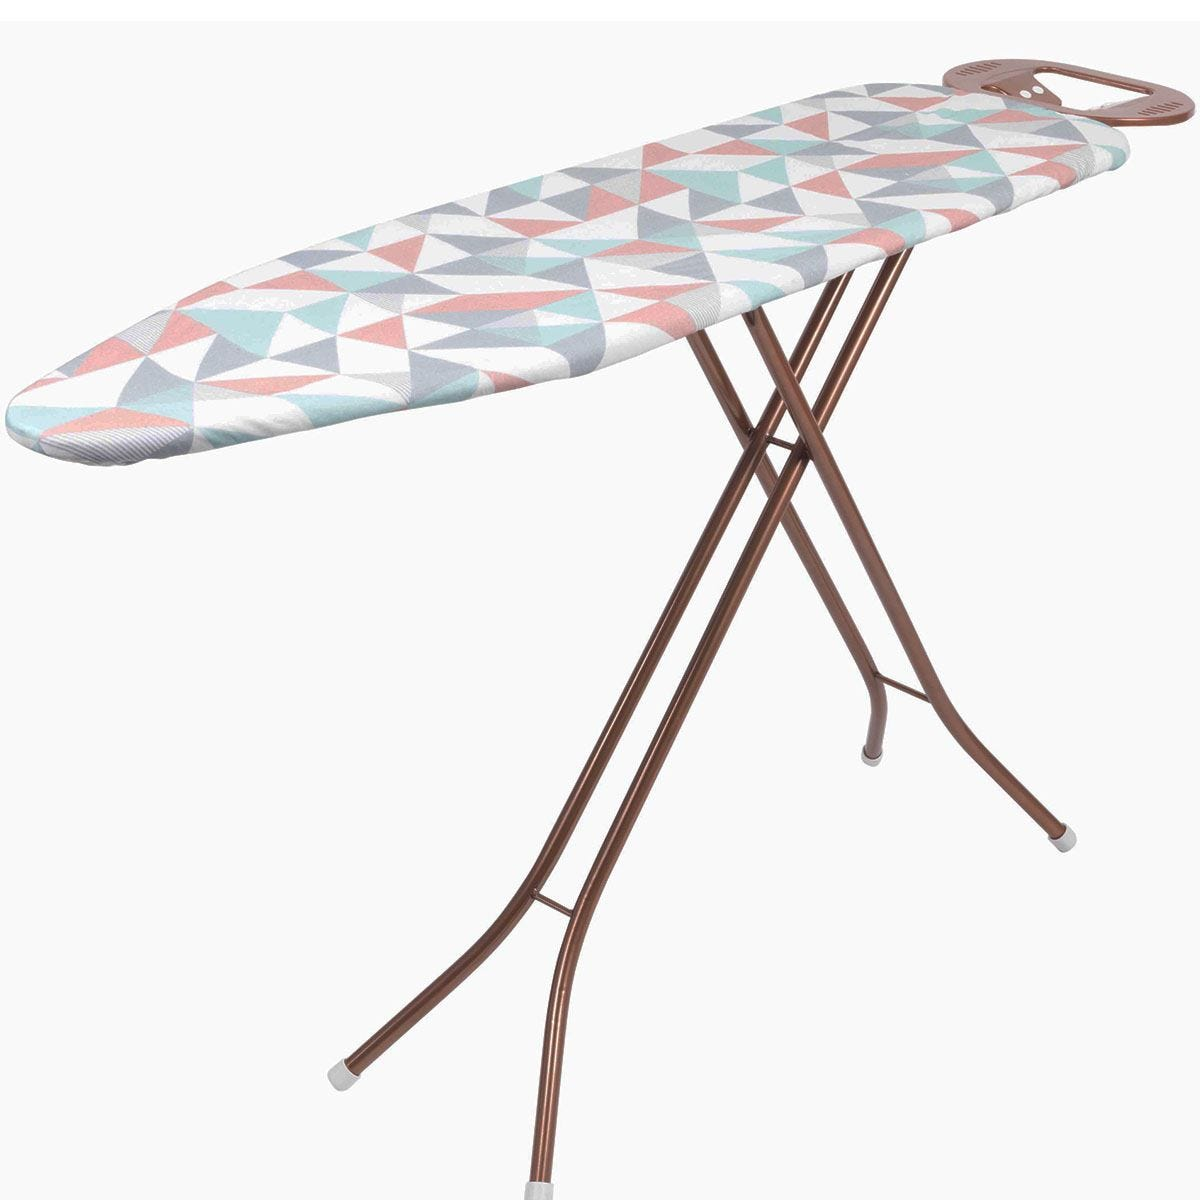 Beldray 137 x 38cm Ironing Board - Rose Gold